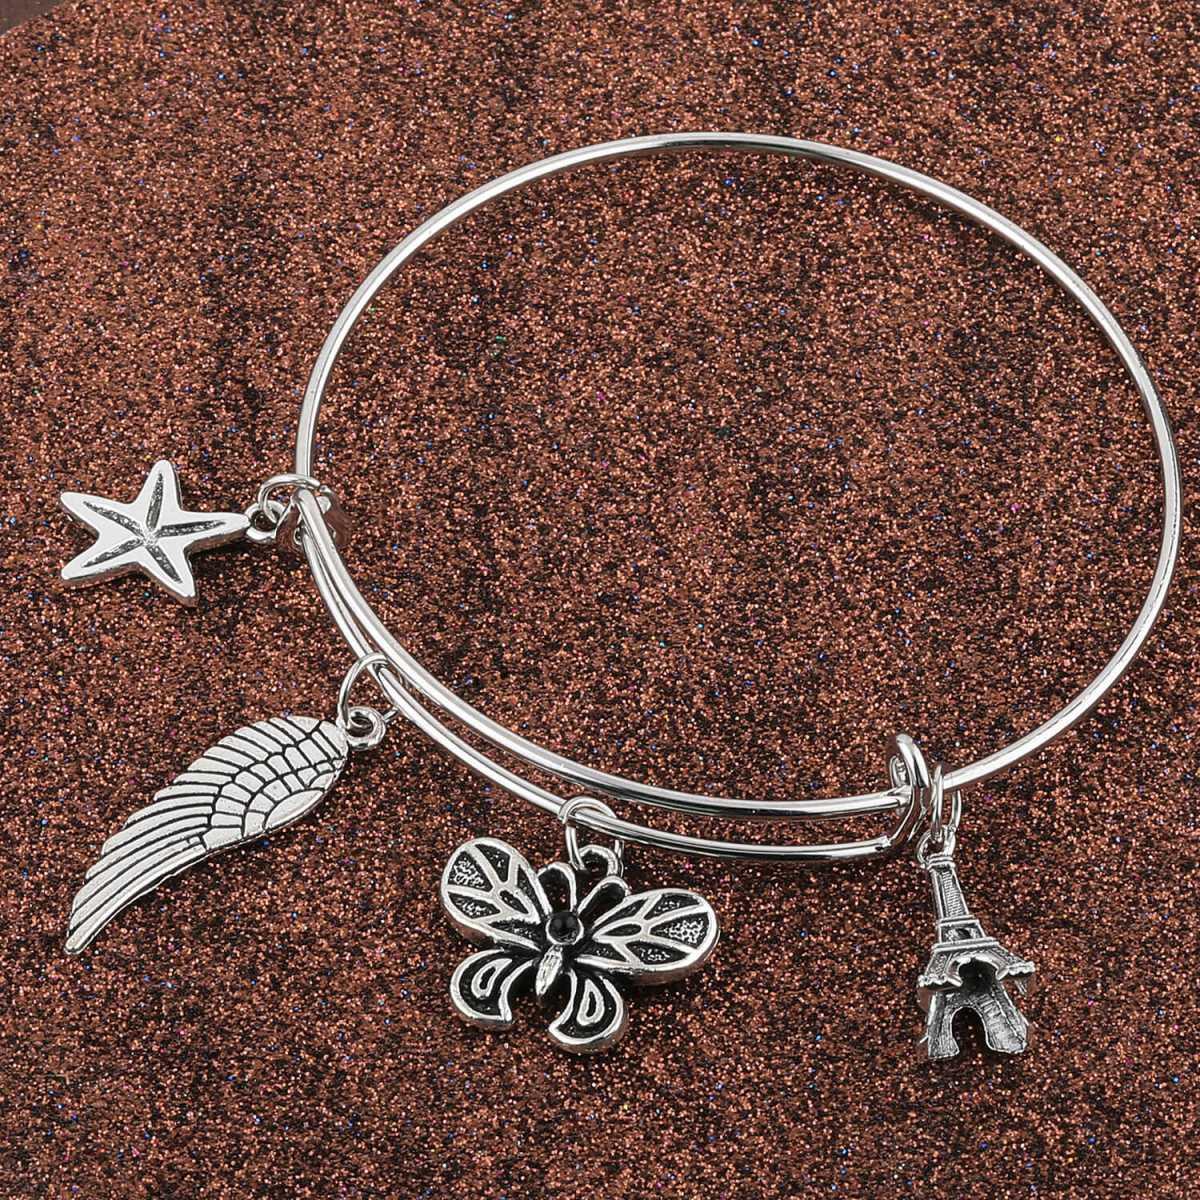 SILVER SHINE Stylish Designer Oxidised Adjustable Bracelet For Women Girls